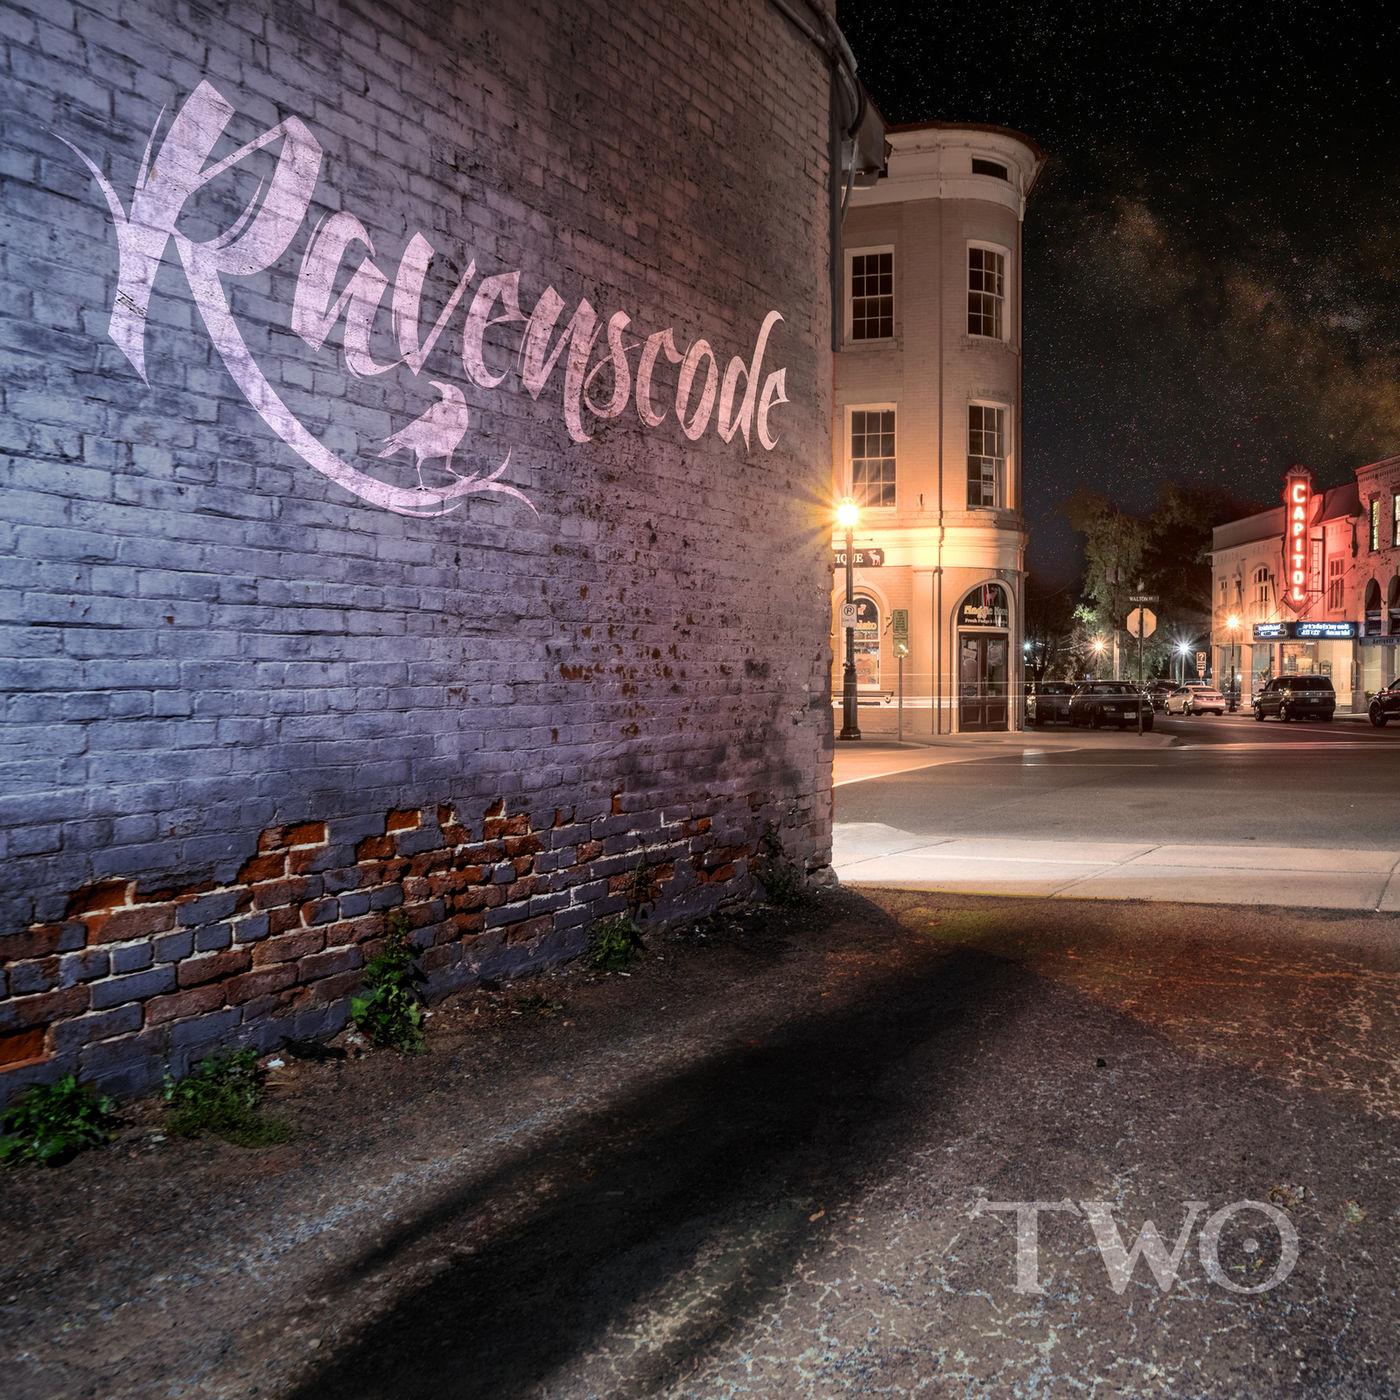 Ravenscode - Two [EP]